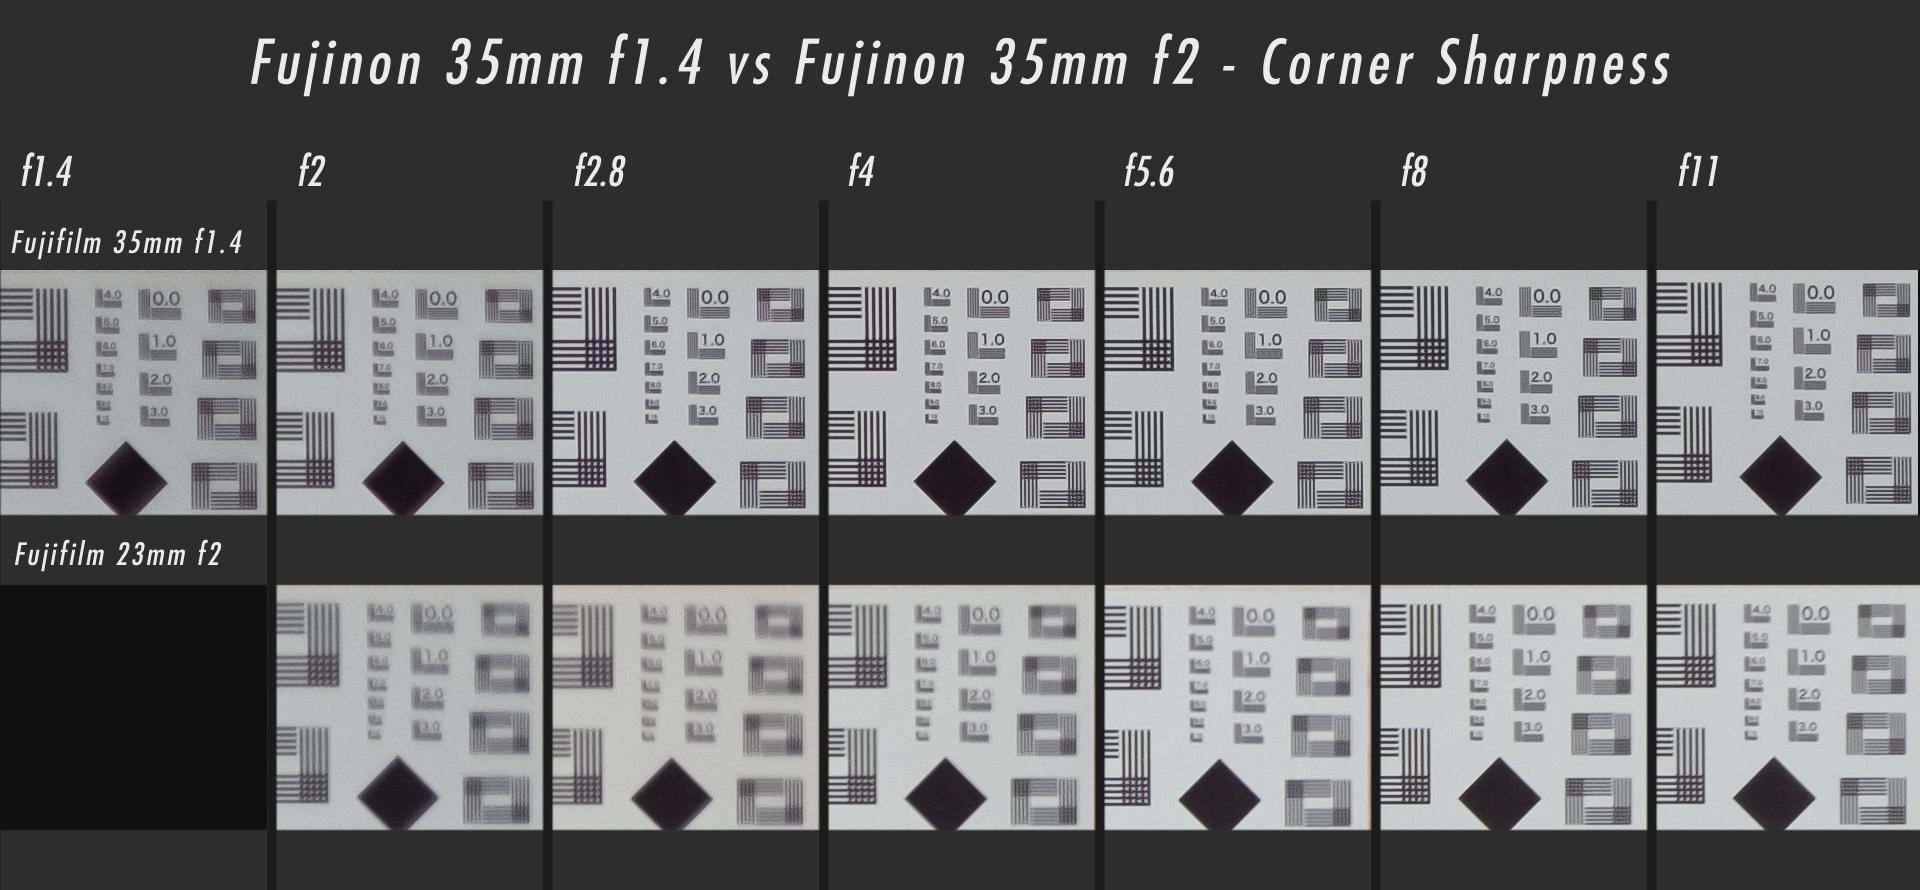 https://i0.wp.com/alikgriffin.com/wp-content/uploads/2019/01/AlikGriffin_Fuji35mmf1.4_35mmf2_CornerSharpness.jpg?zoom=2&w=1596&h=740&ssl=1